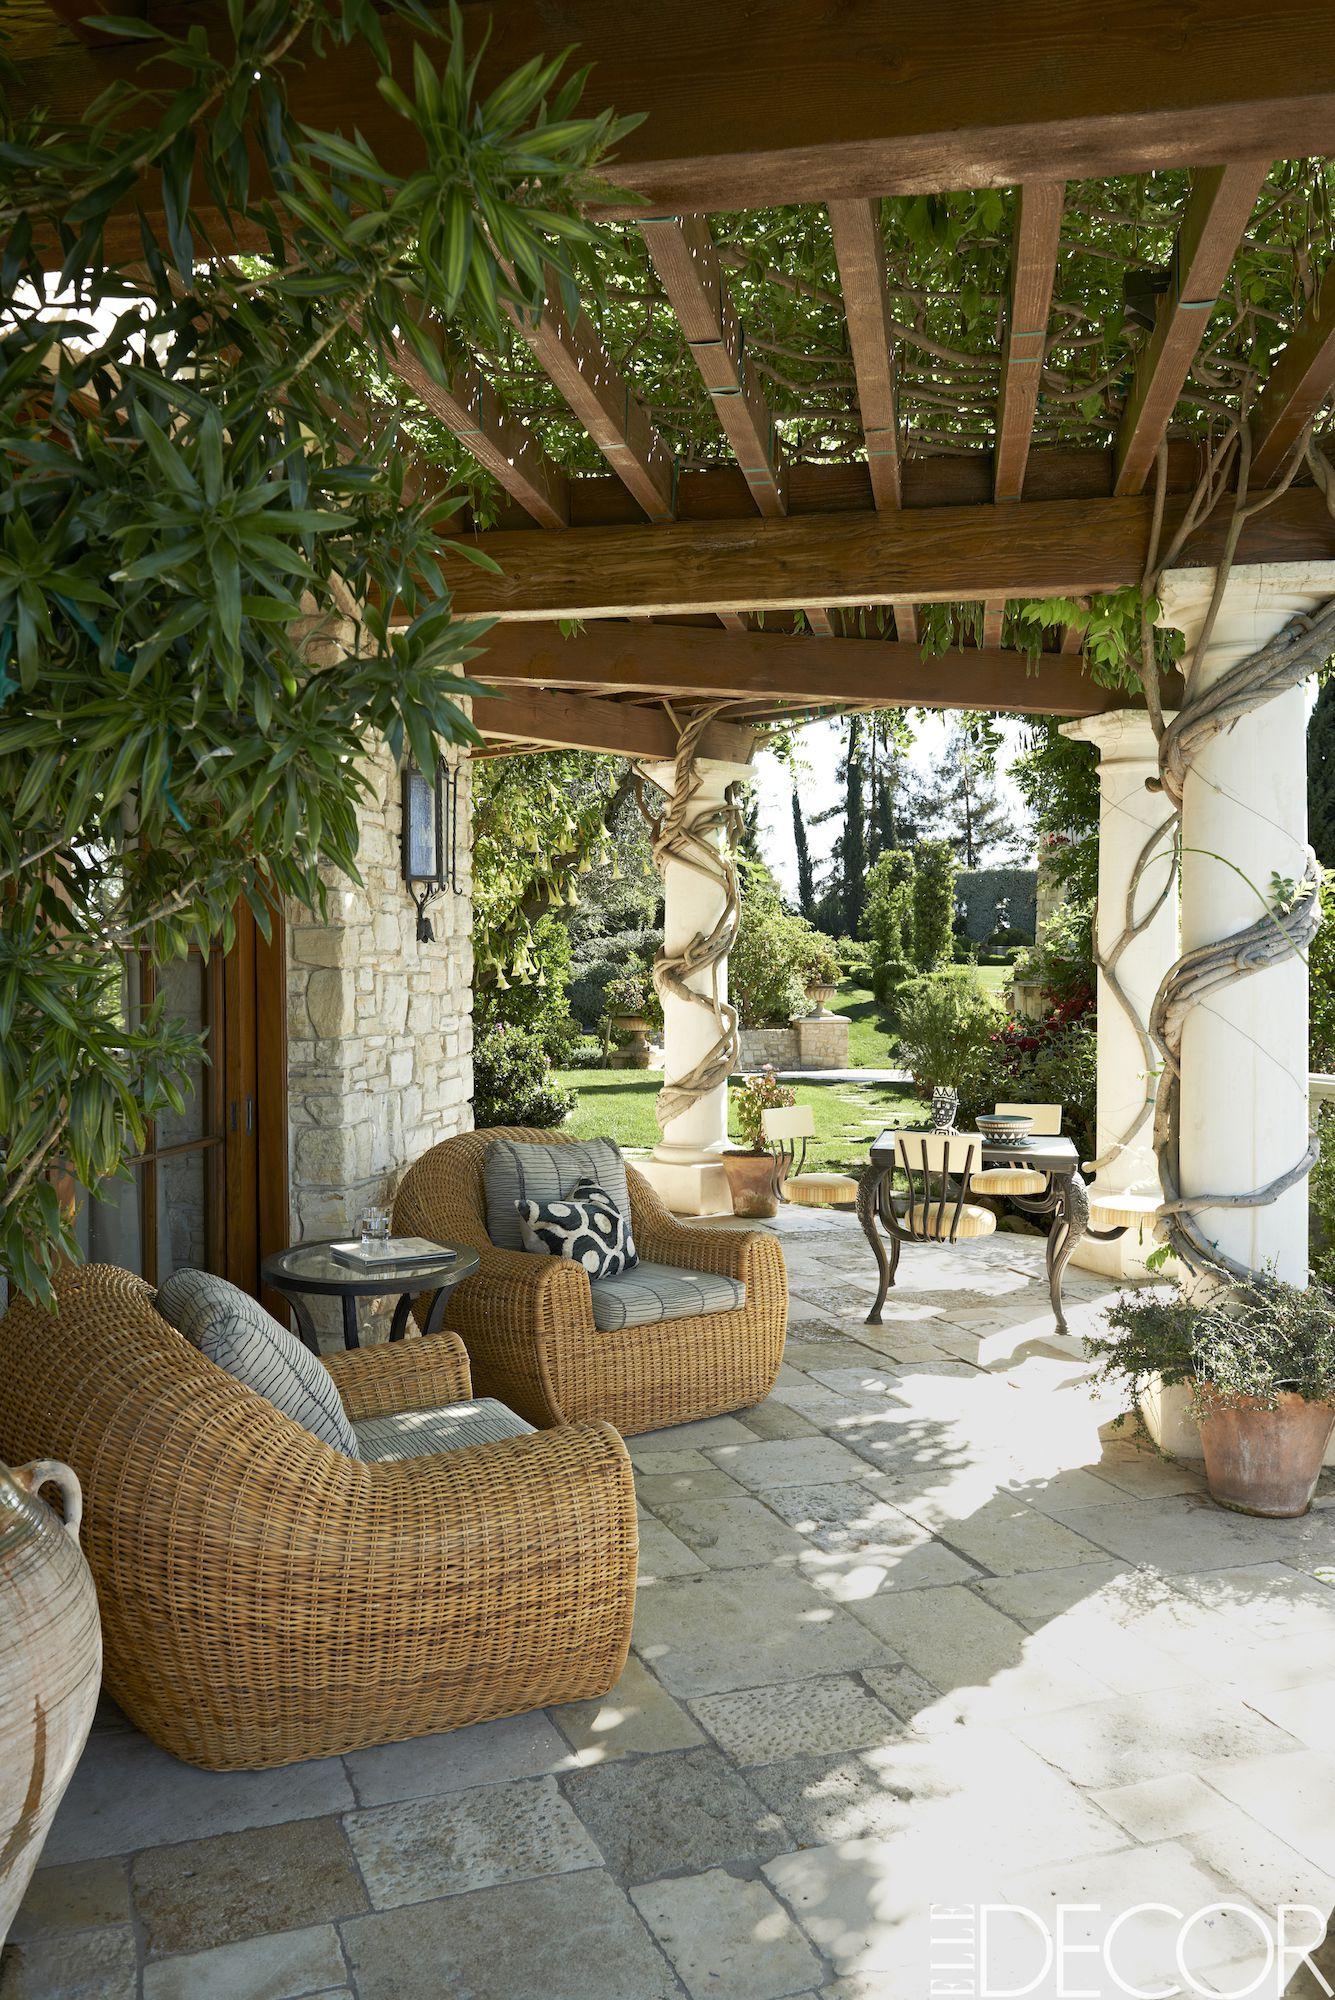 40 best small patio ideas - small patio furniture u0026 design CNLFUDM